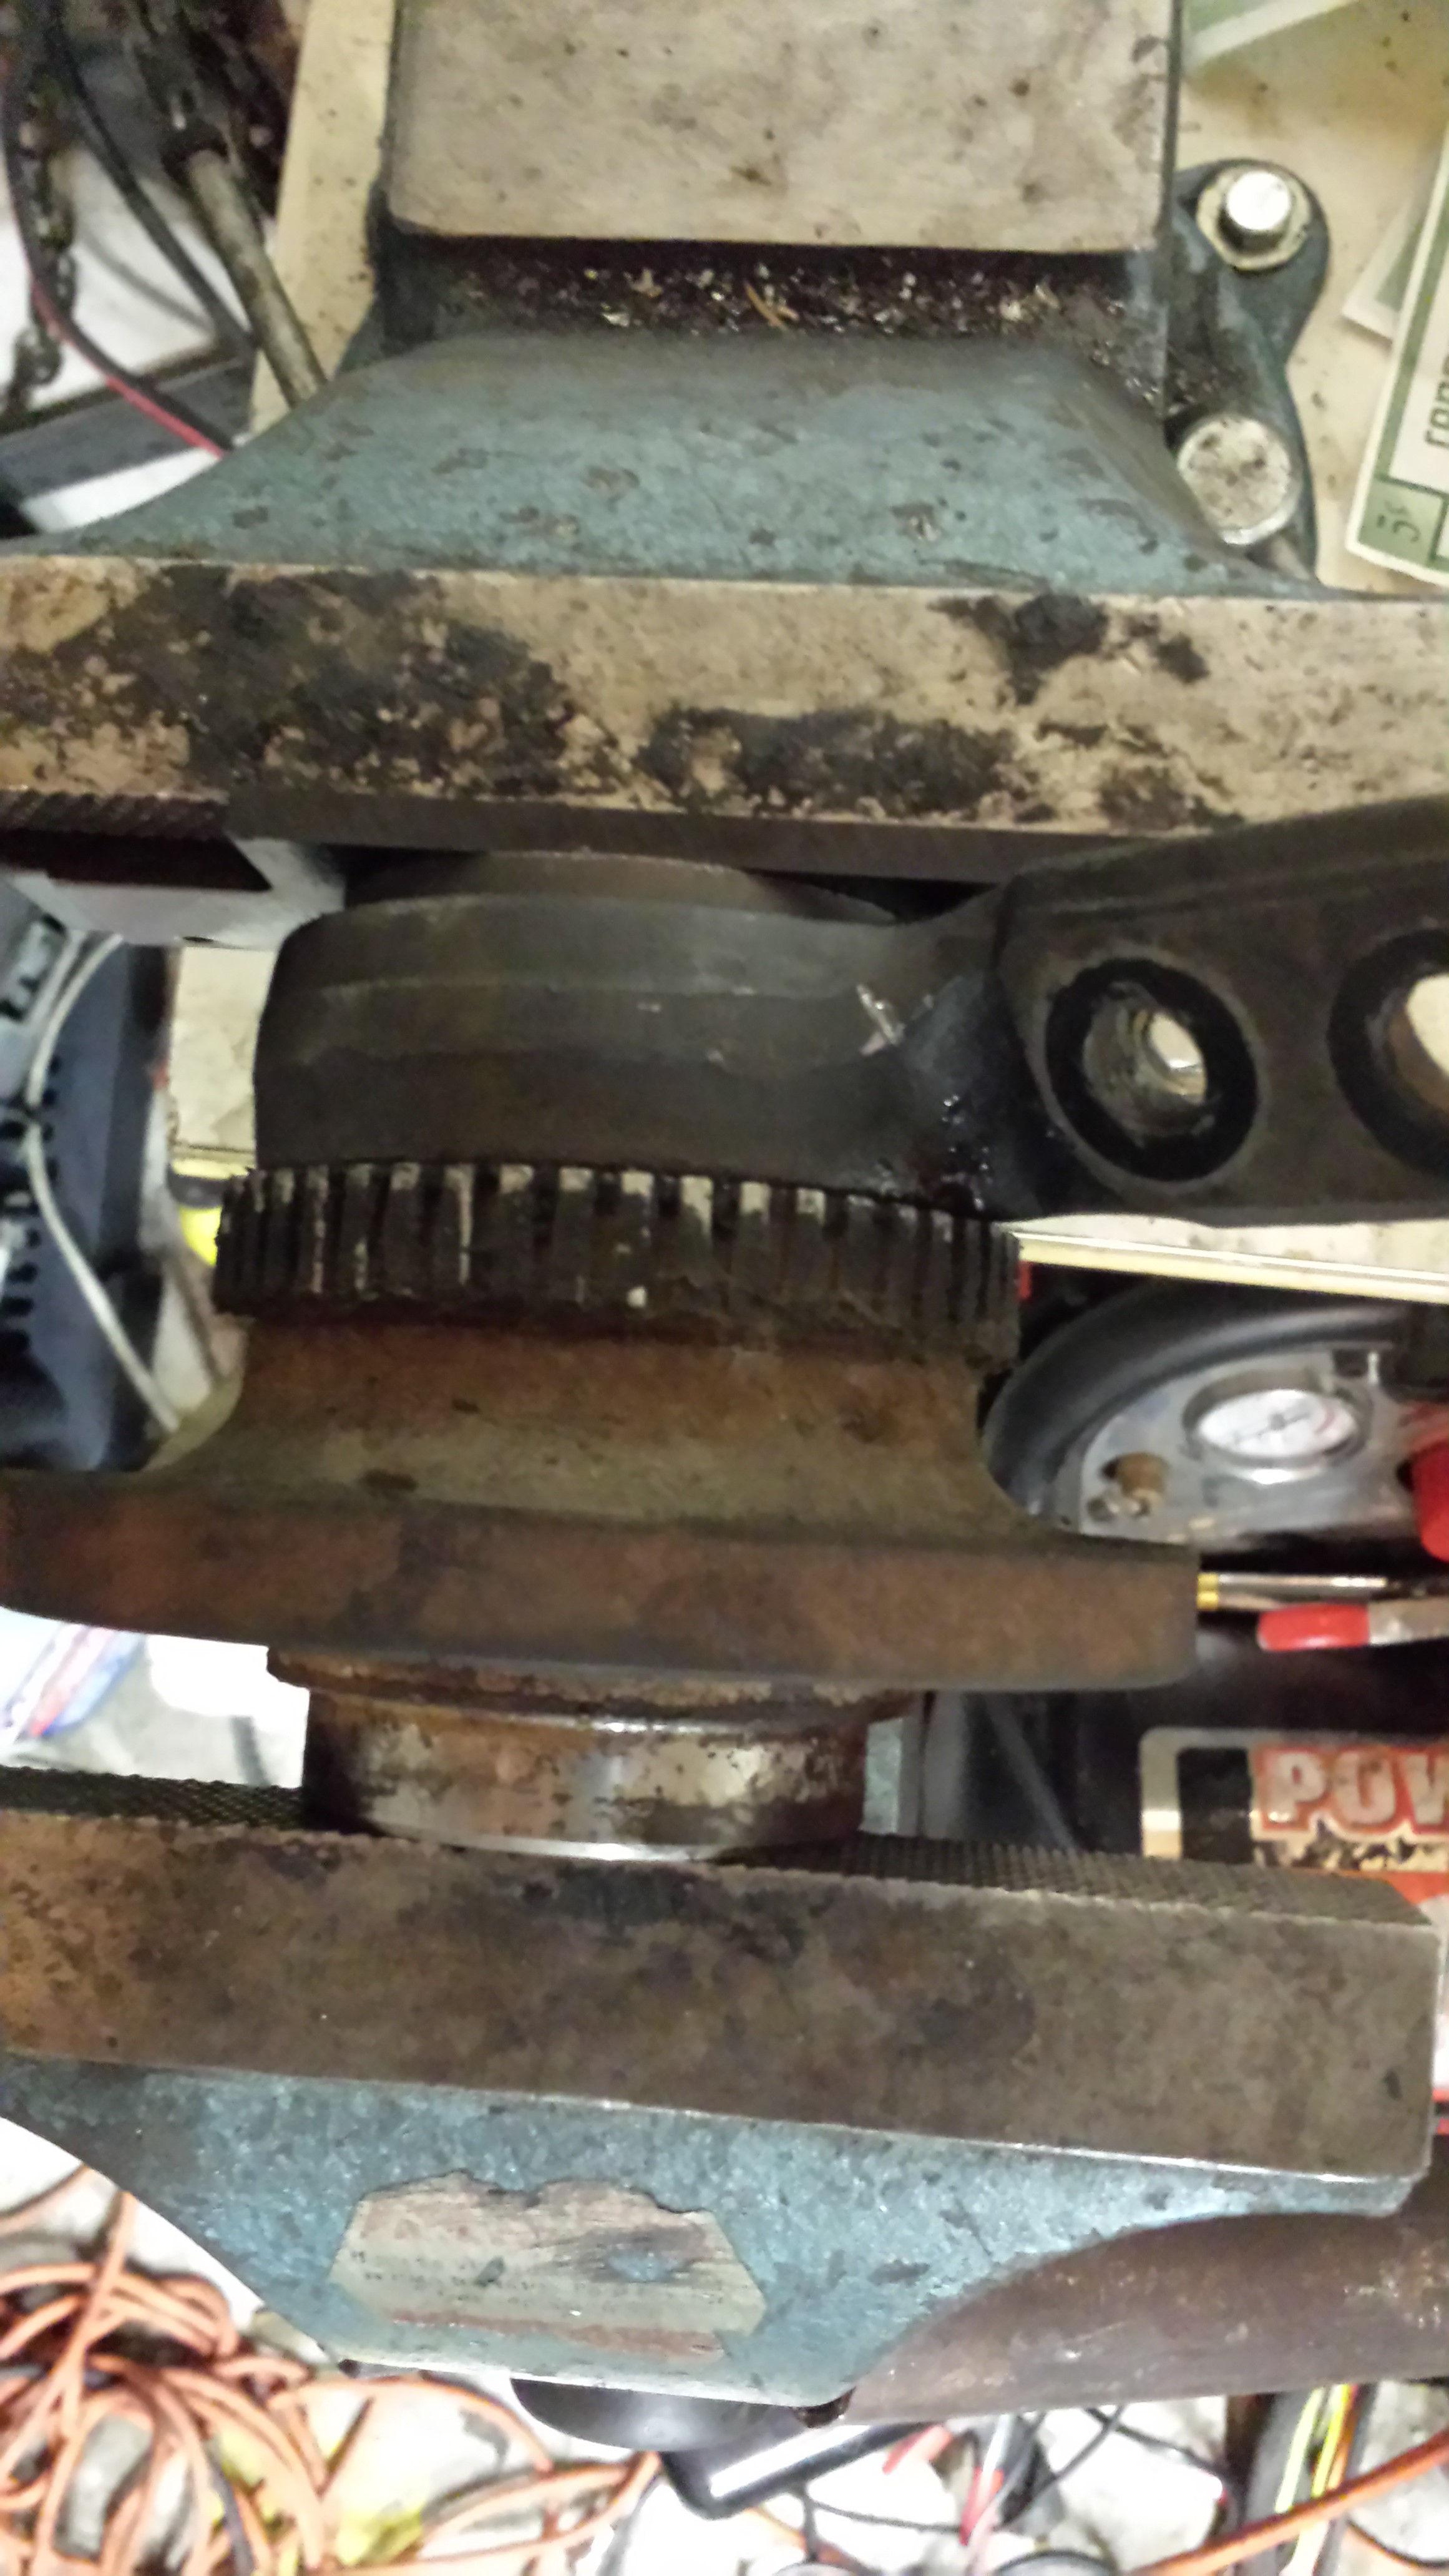 E30/E36/E46 BMW control arm bushing specialty tools and tips